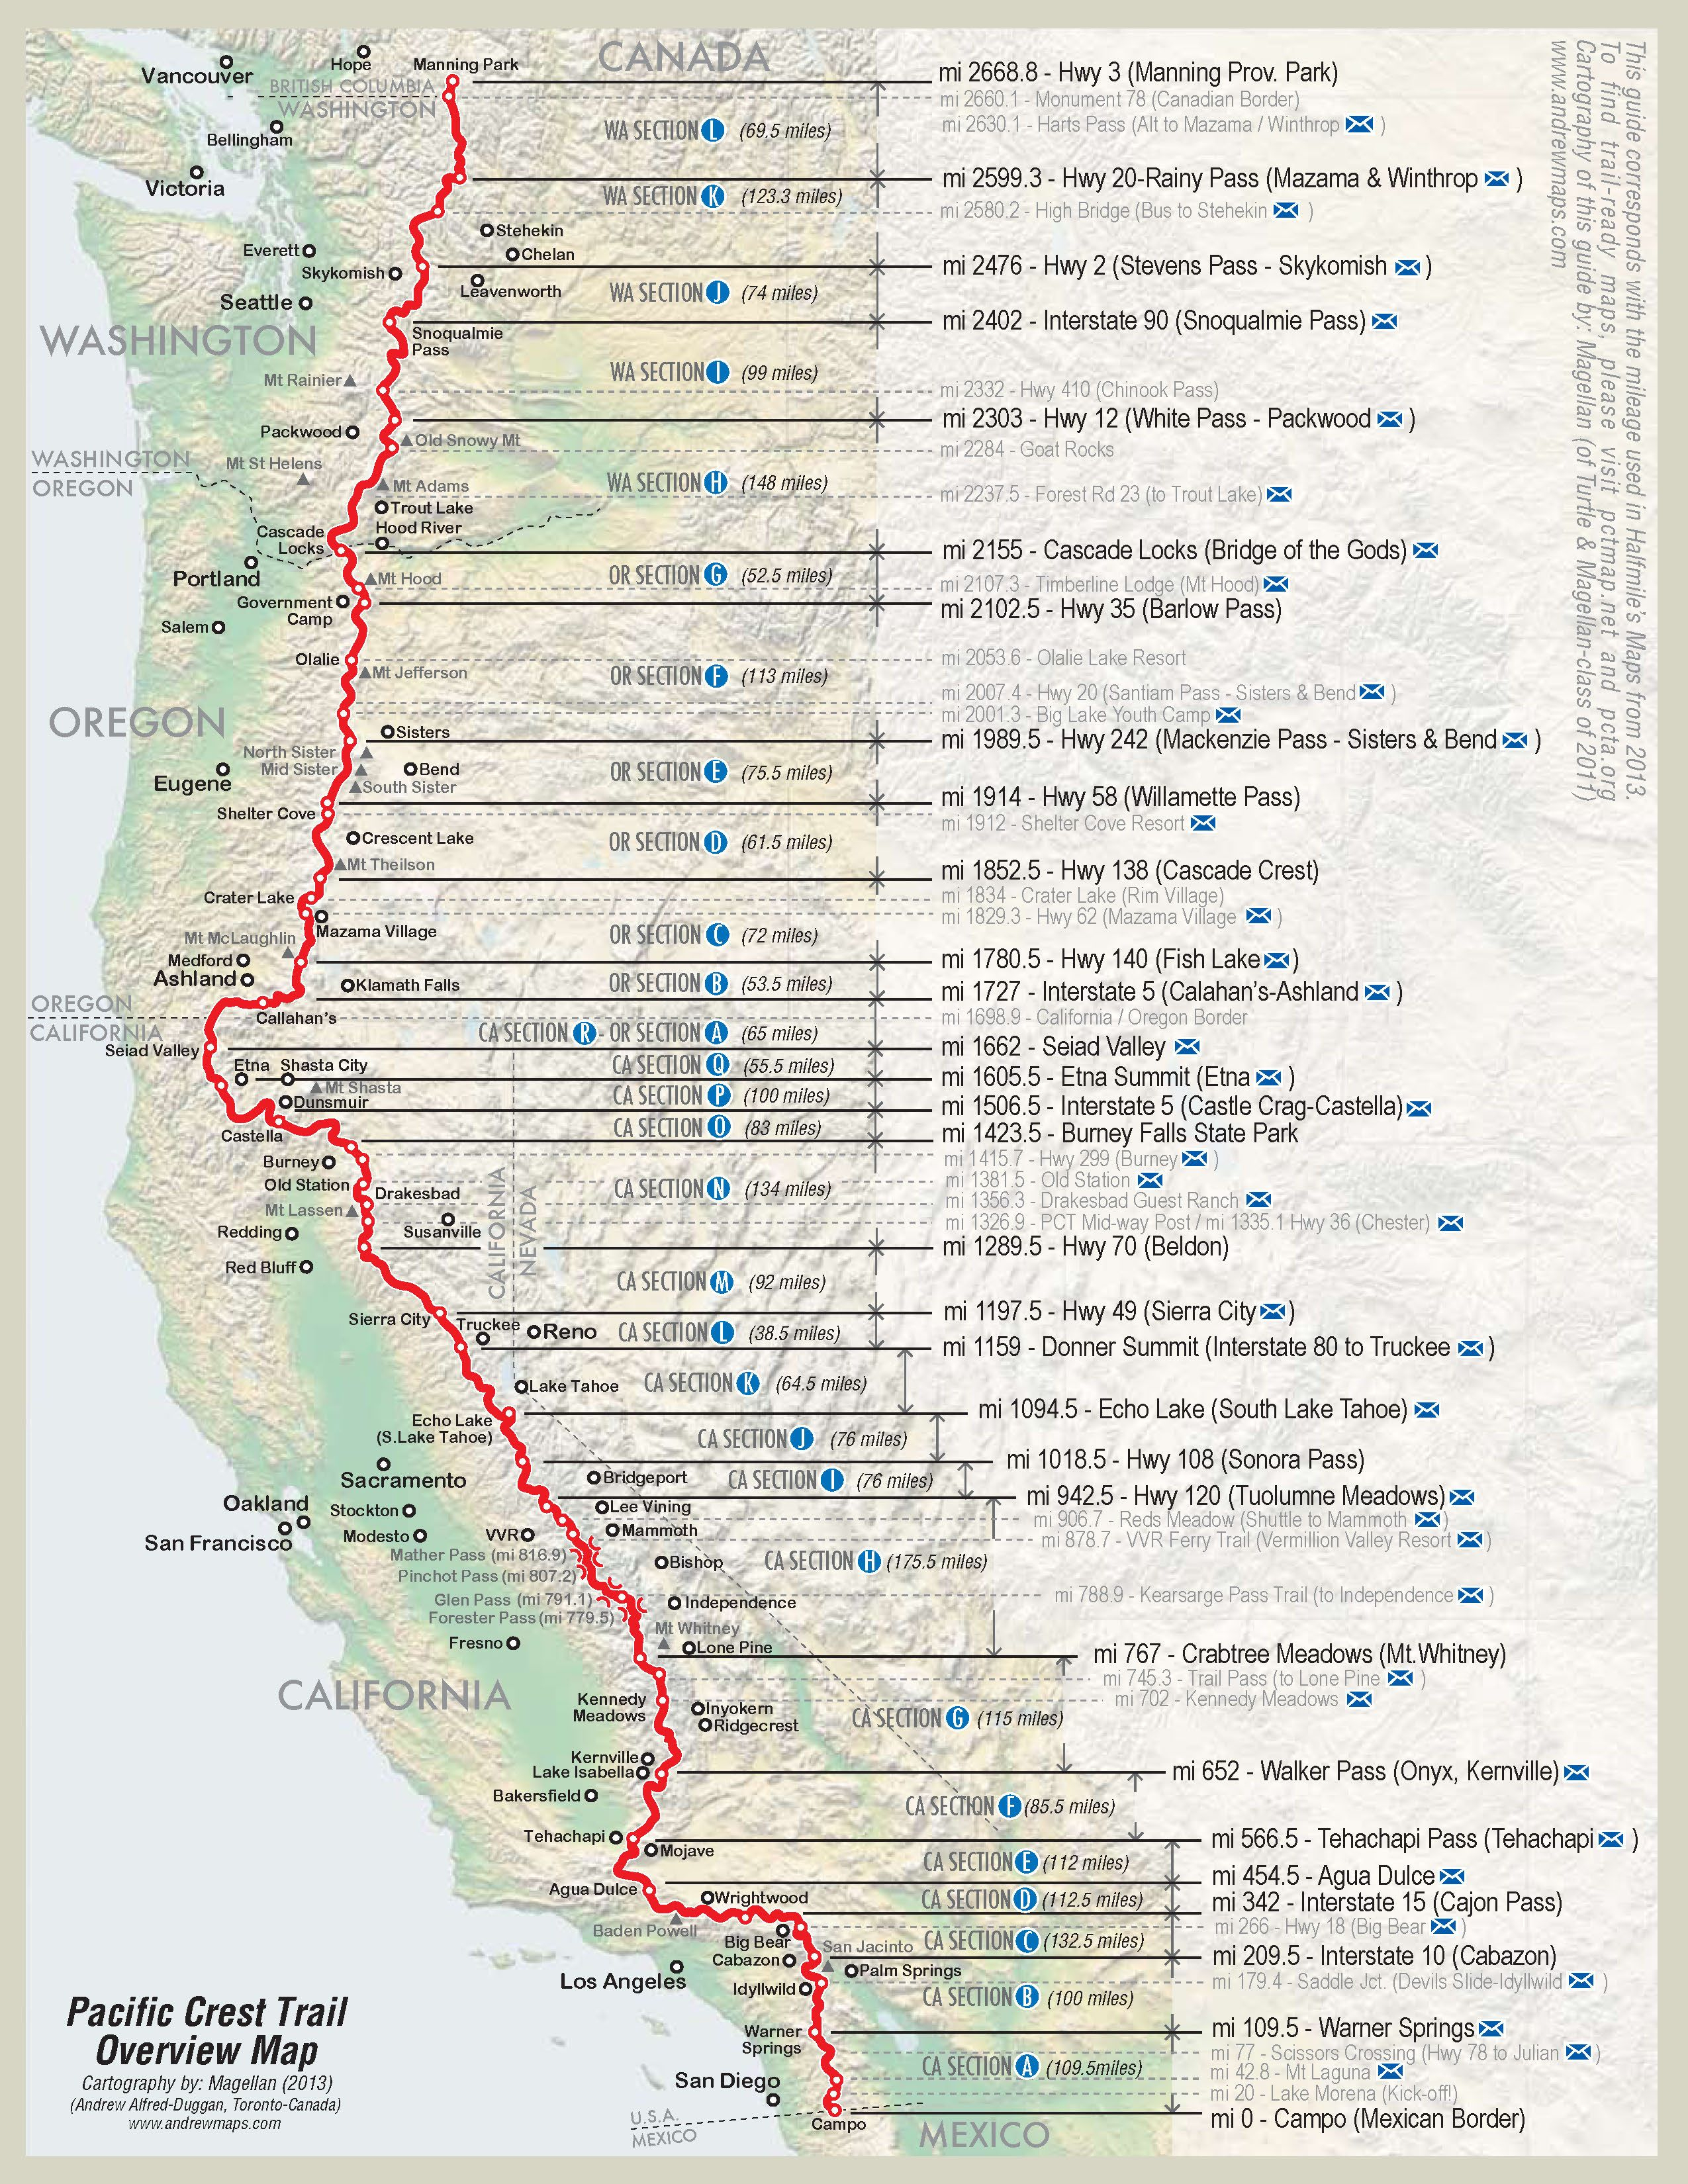 Ffafefdaab California Road Map Pacific Crest Trail Map California - Pct Map California